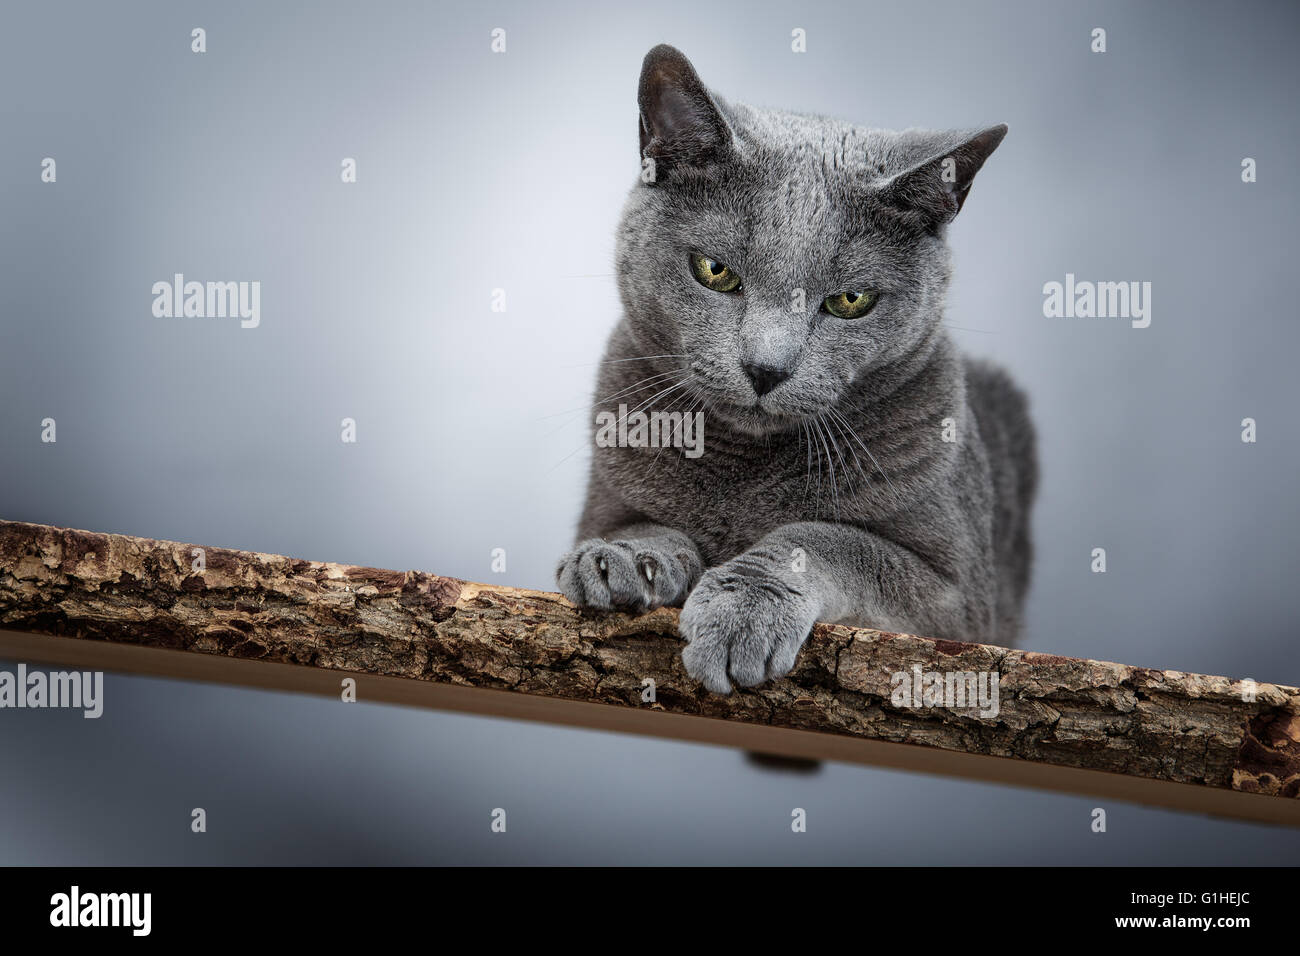 Russisch Blau Katze Portrait Stockbild